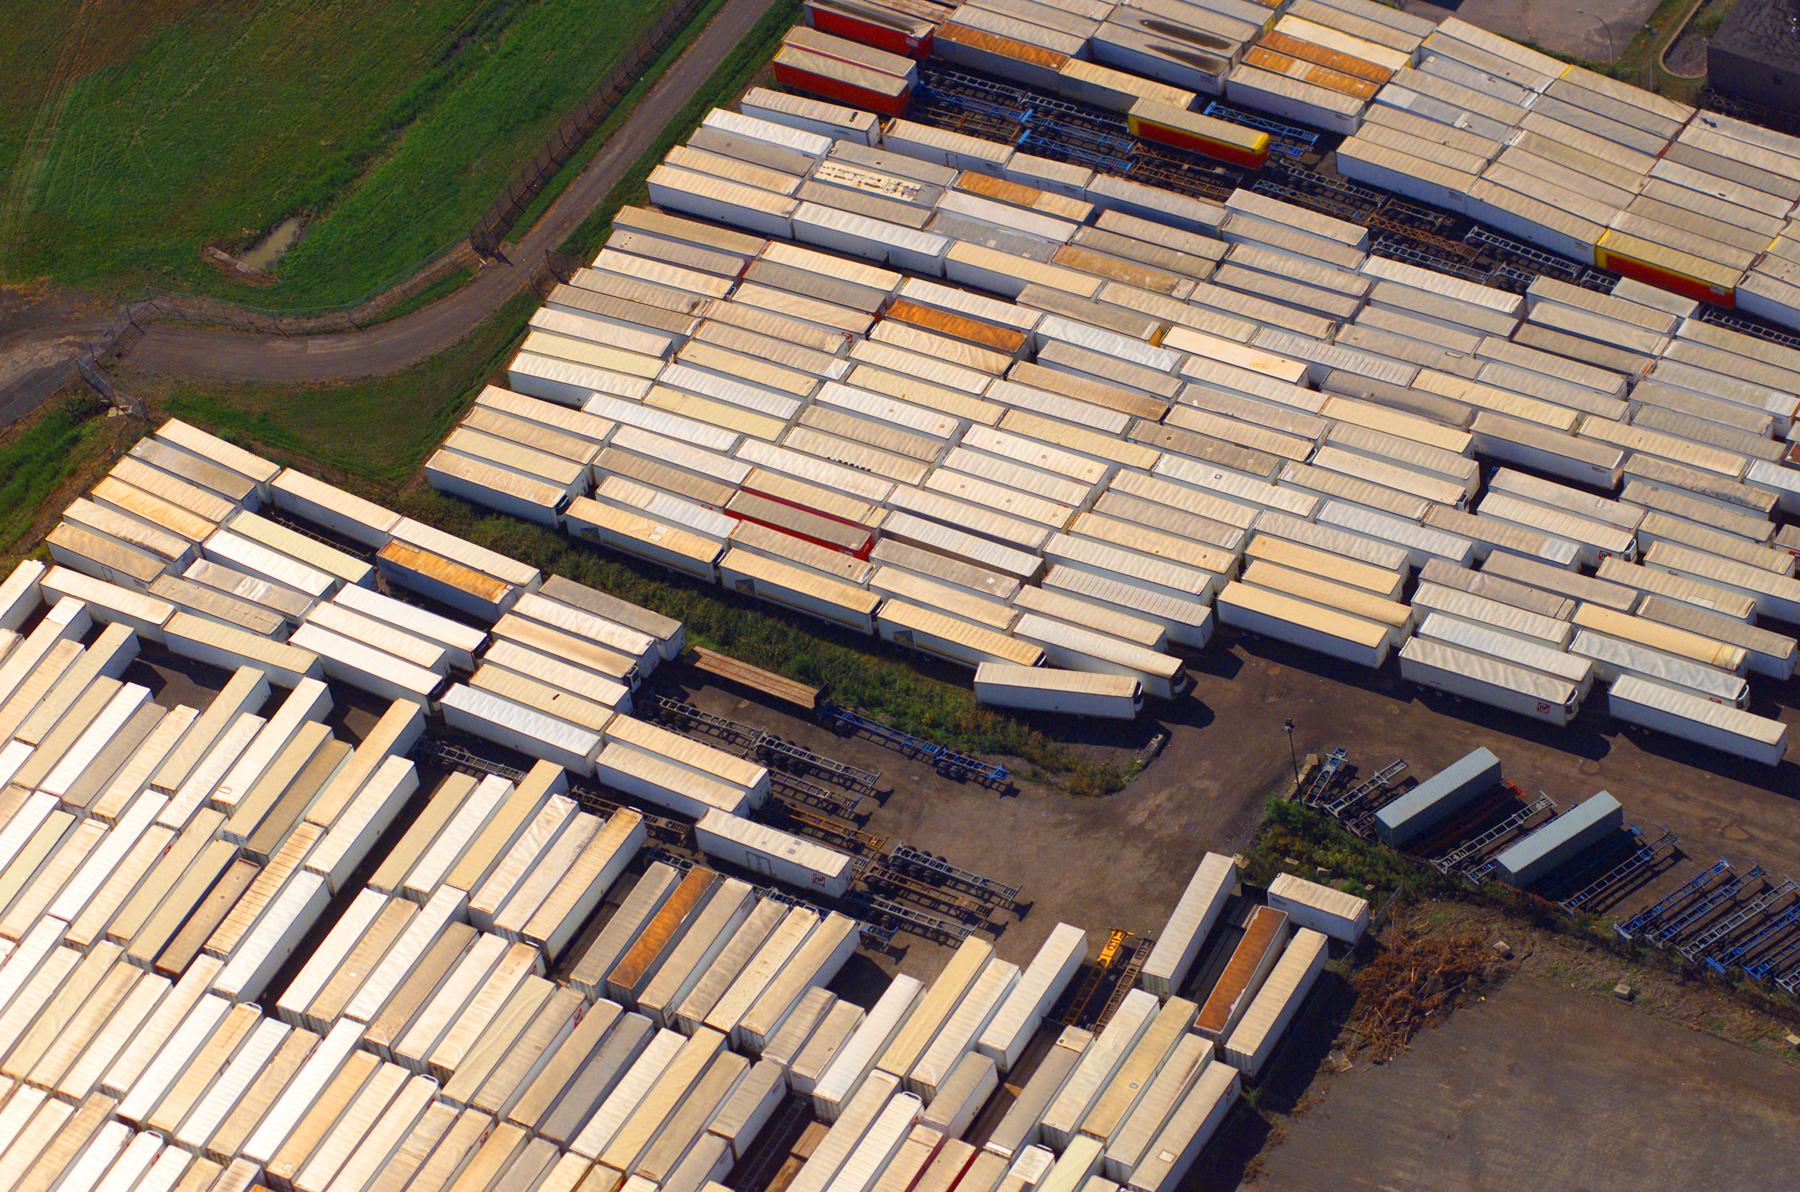 Entreposage de containers, Montreal